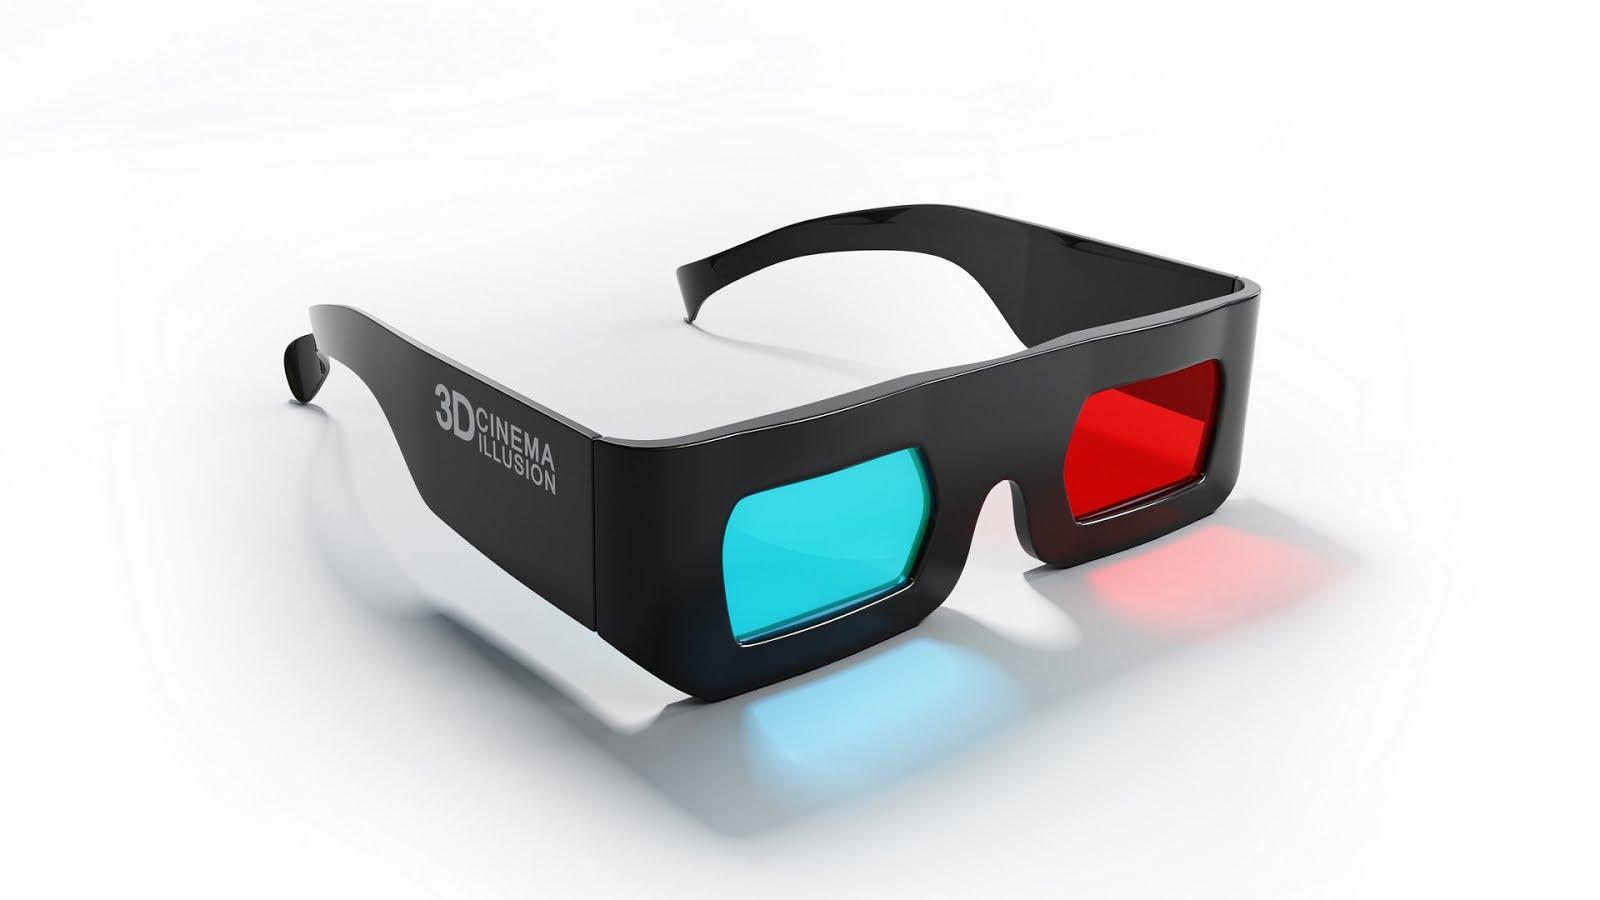 3d очки на компьютер своими руками